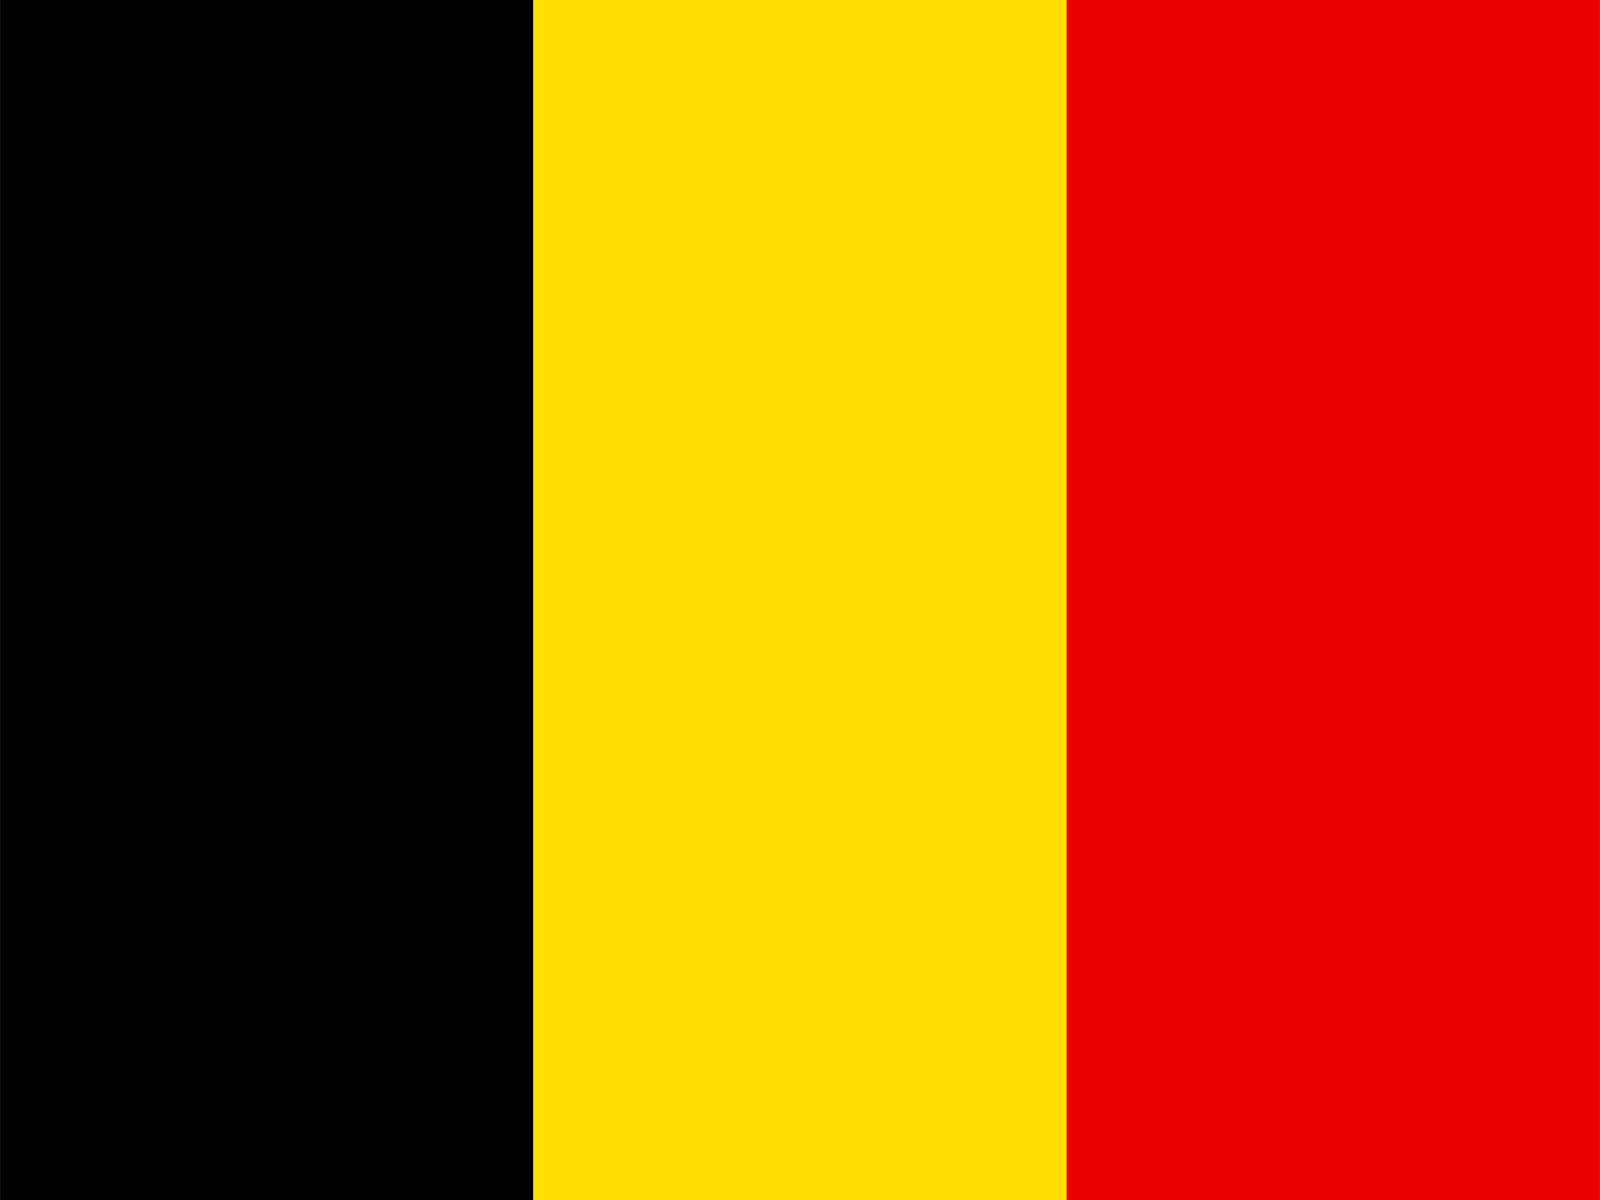 Belgium Flag PPT Backgrounds